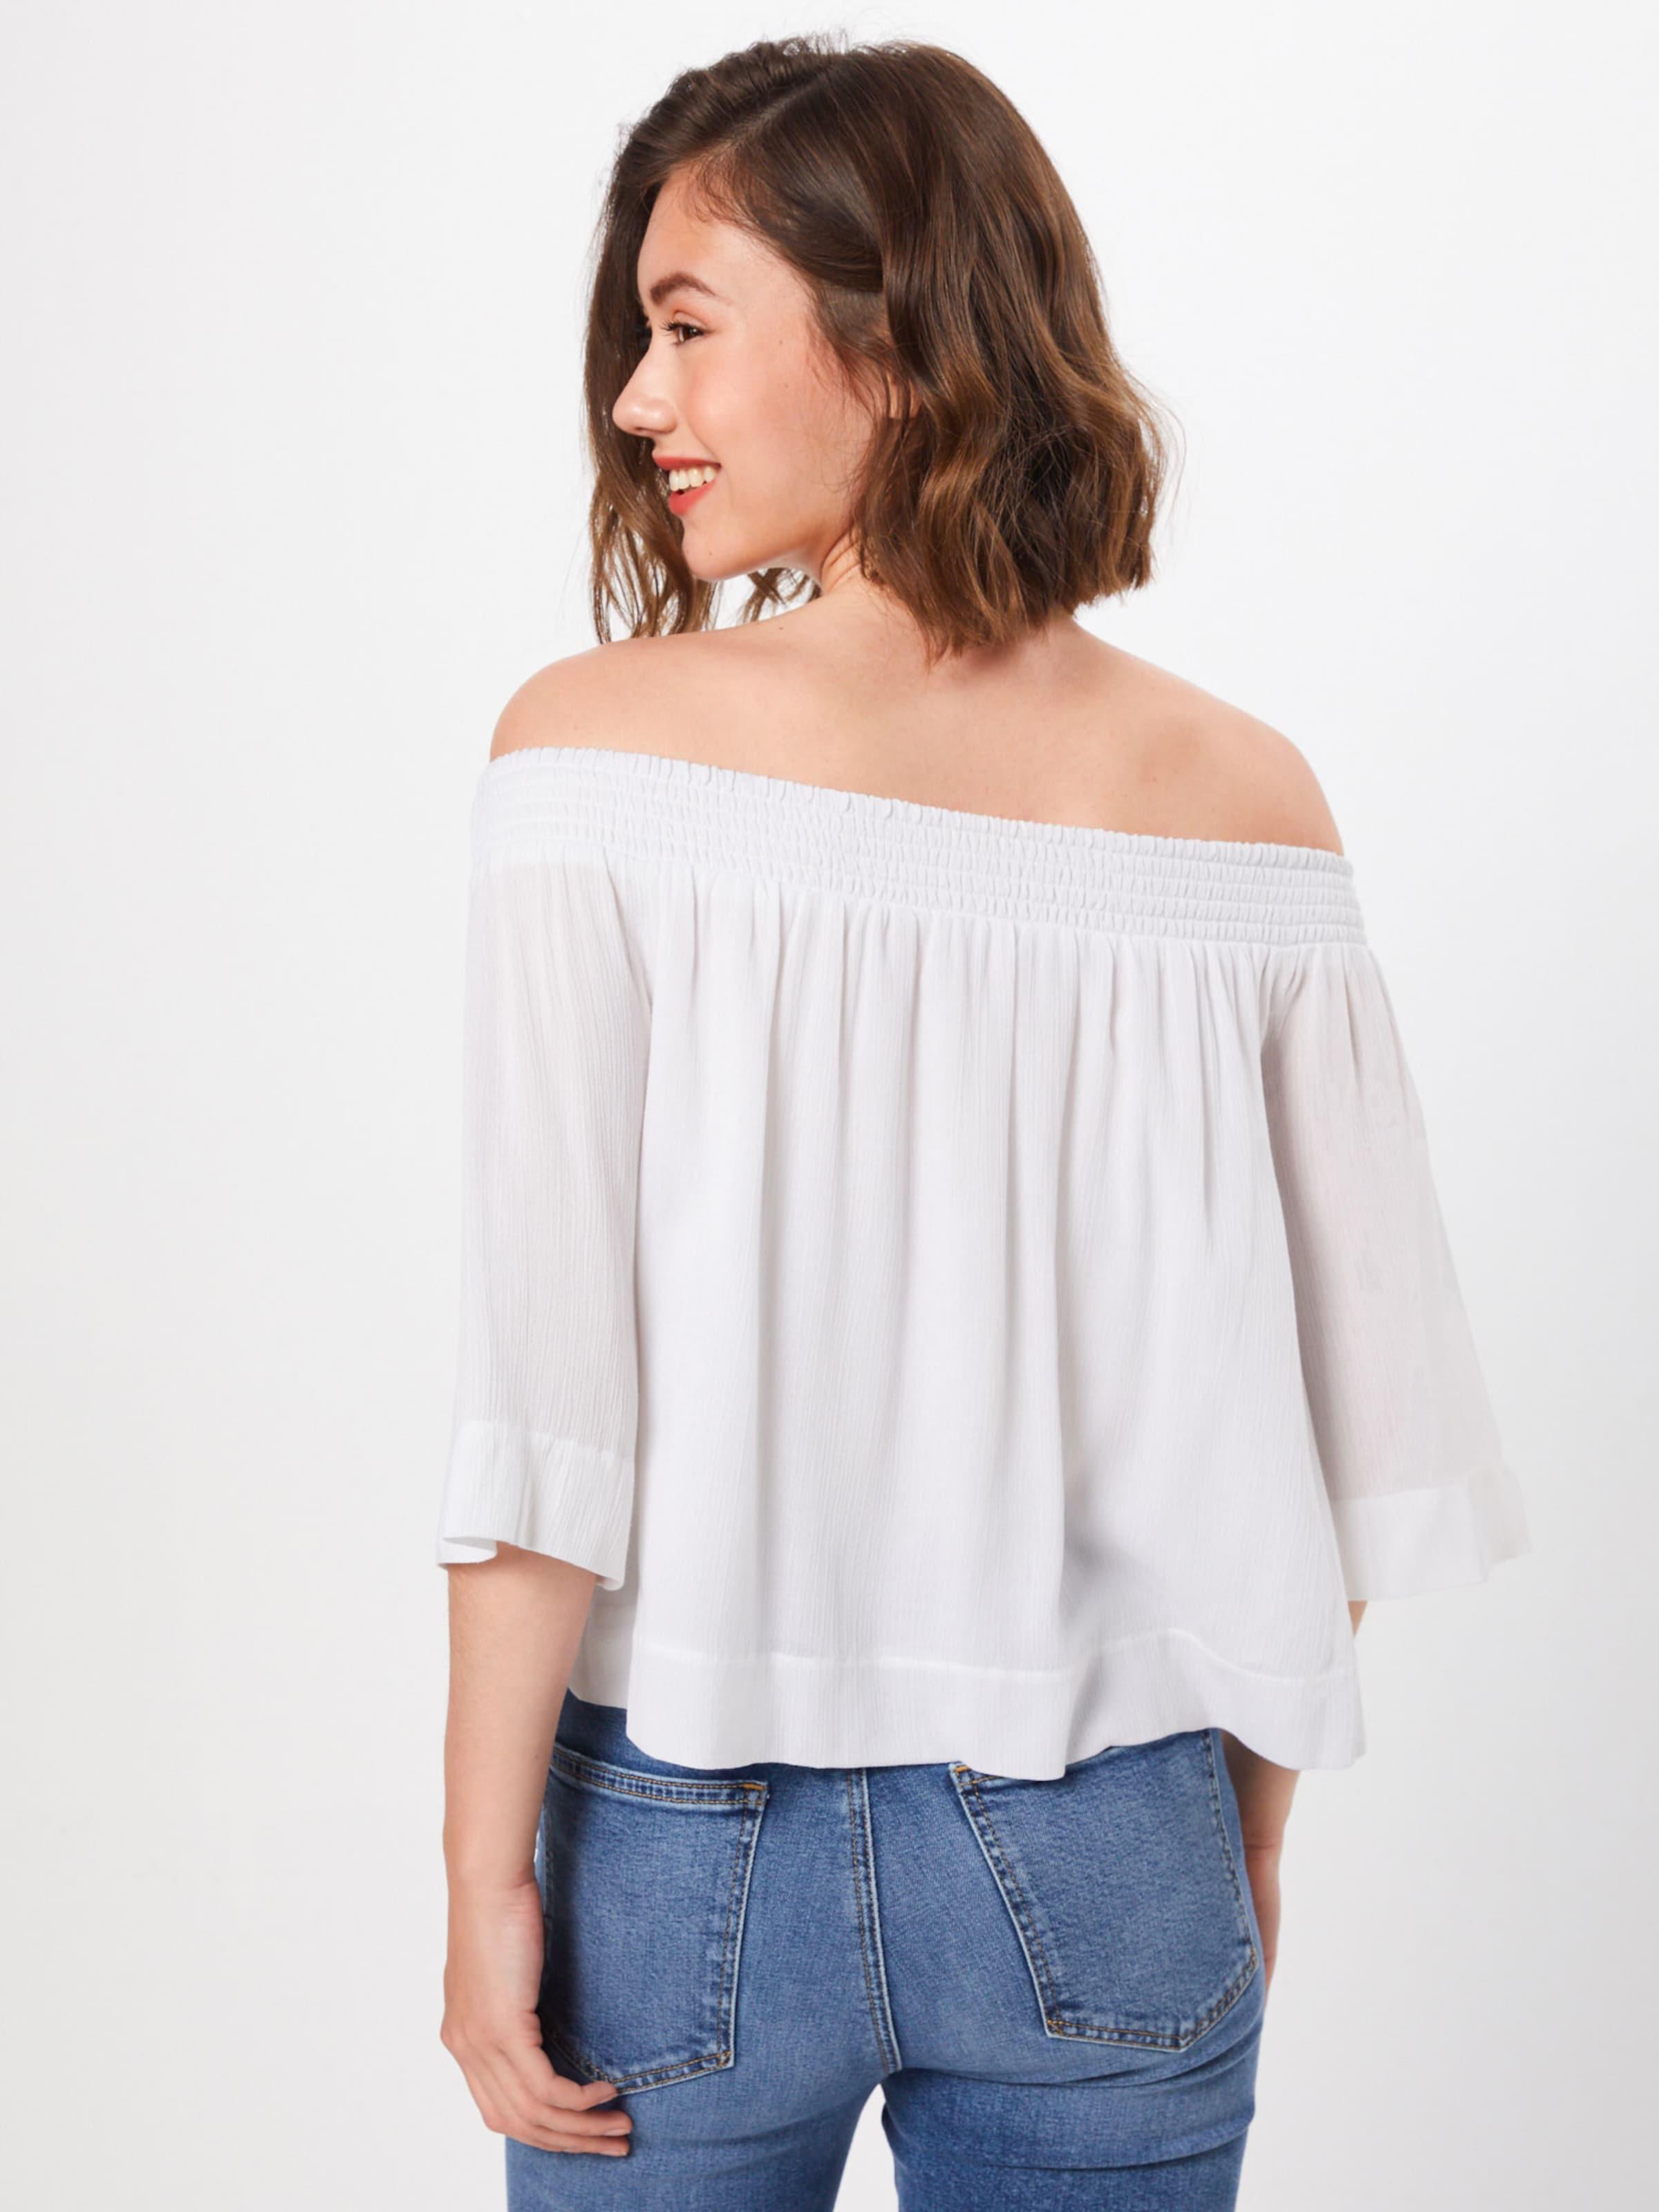 About T shirt Blanc En 'camille' You TcJlF1K